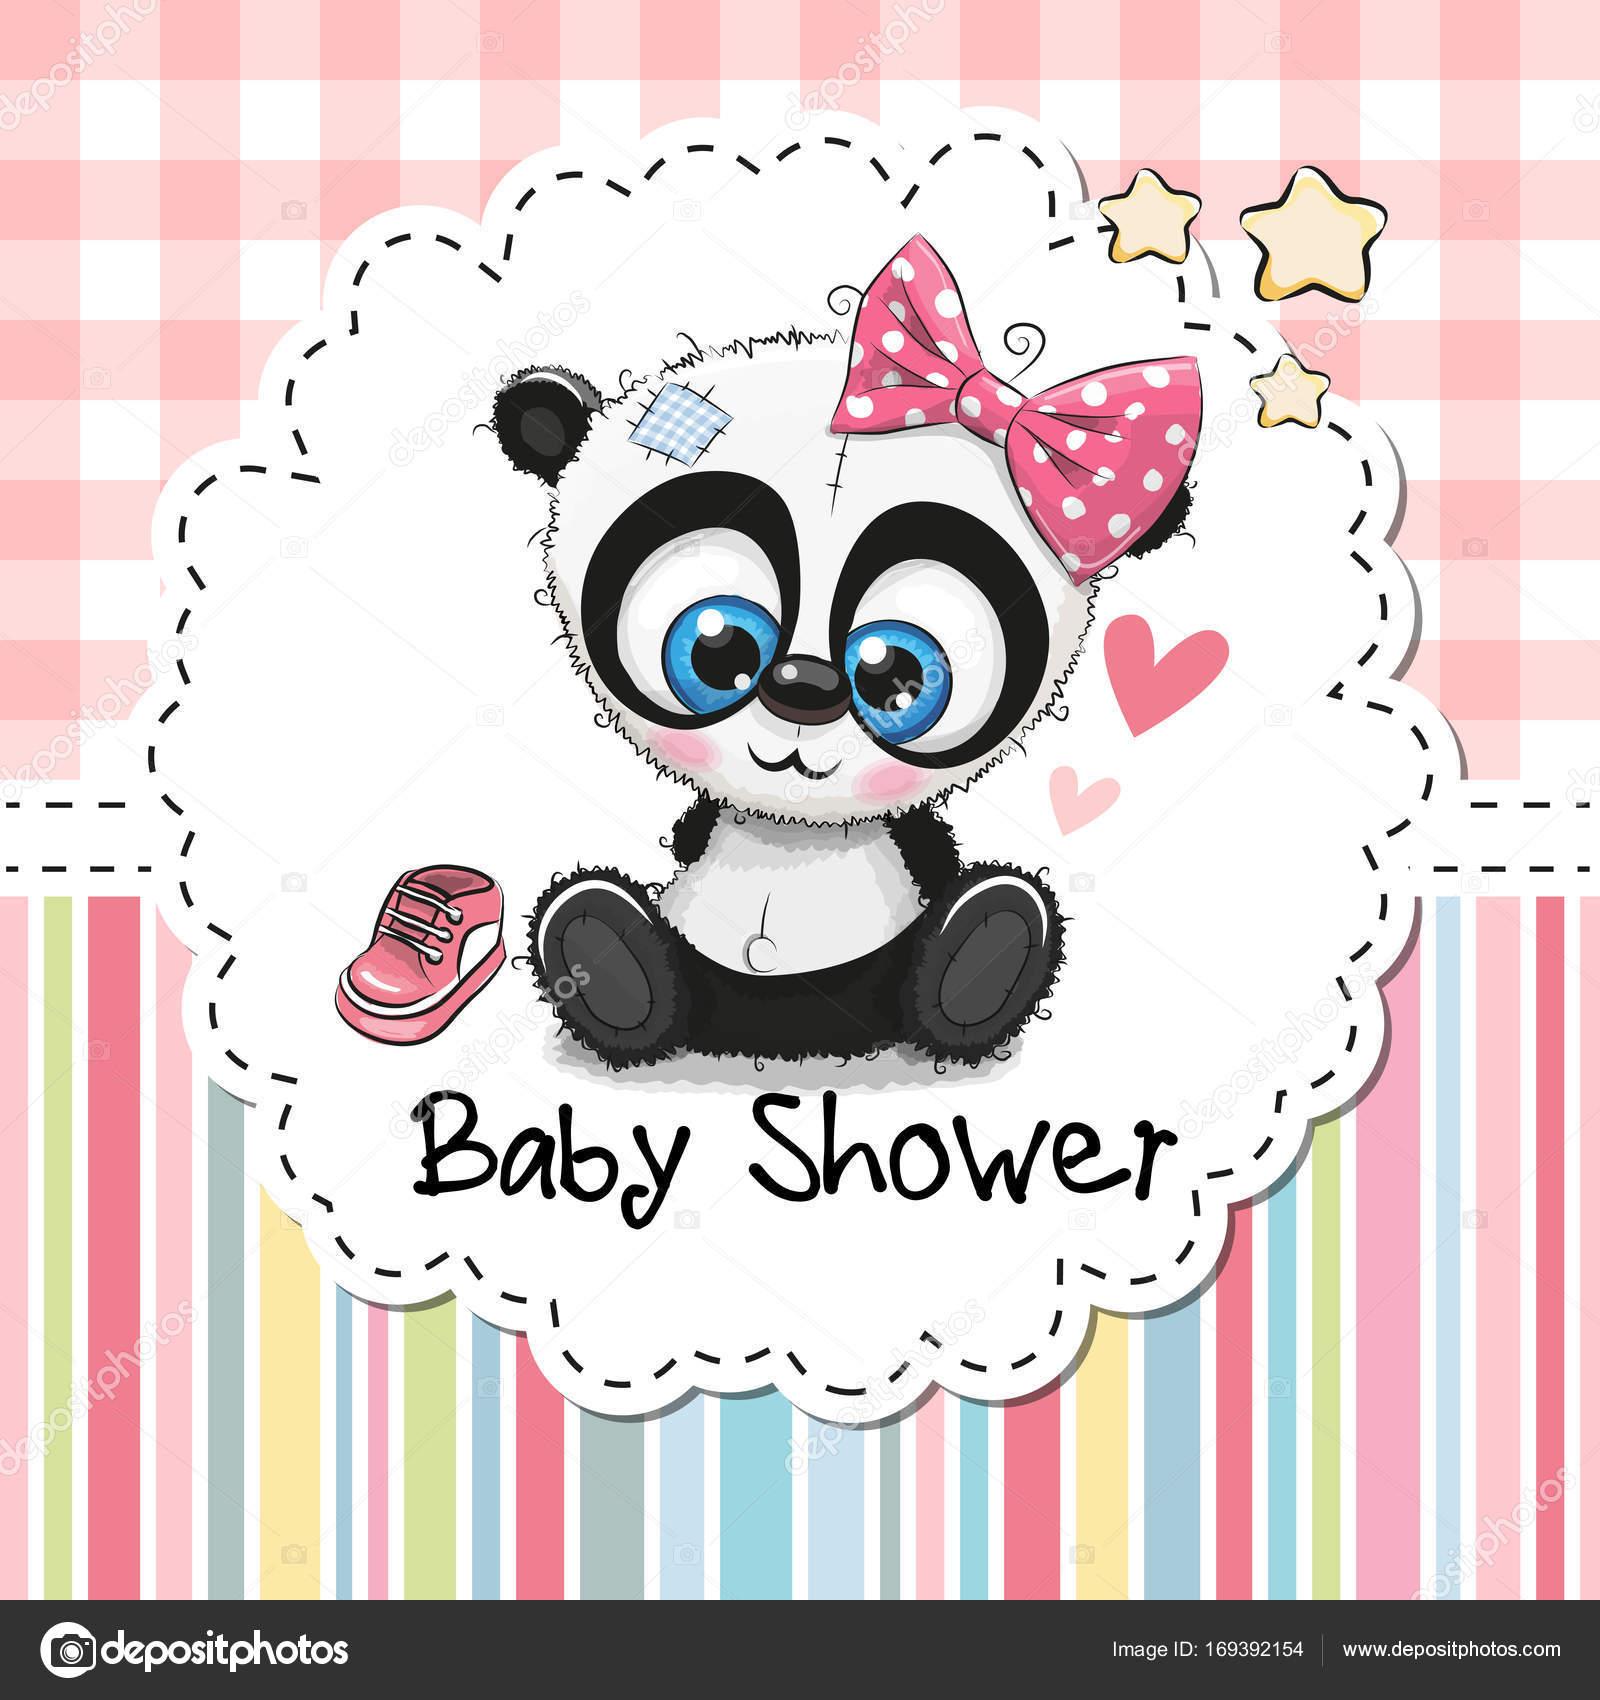 Baby Shower Greeting Card With Cartoon Panda Girl Stock Vector